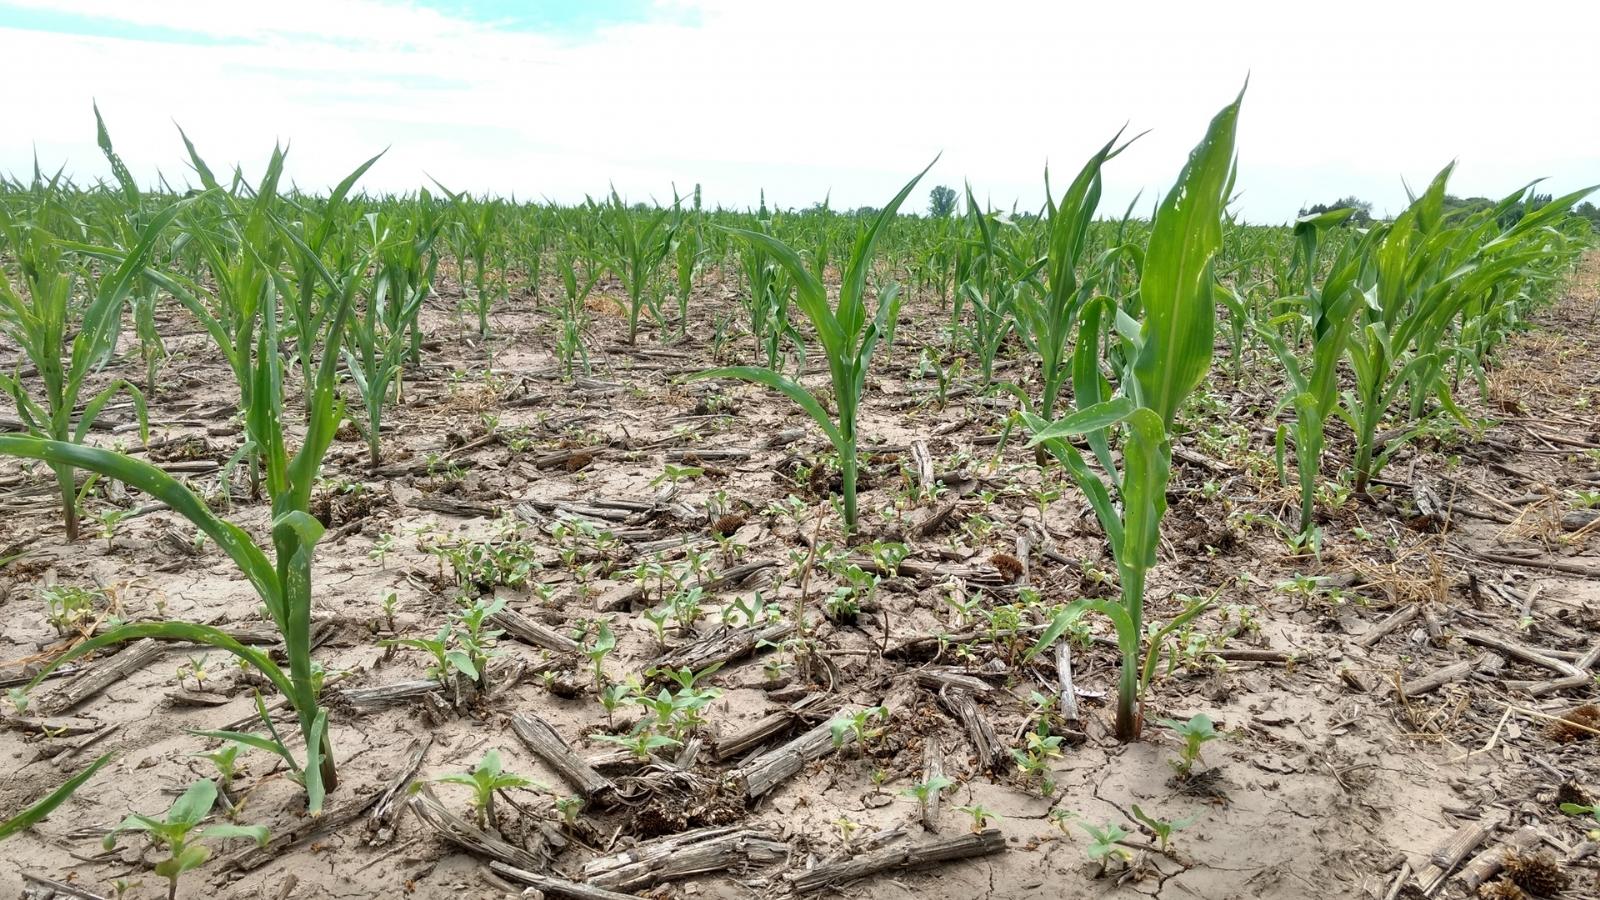 Declararon la emergencia agropecuaria por sequía para 27 municipios